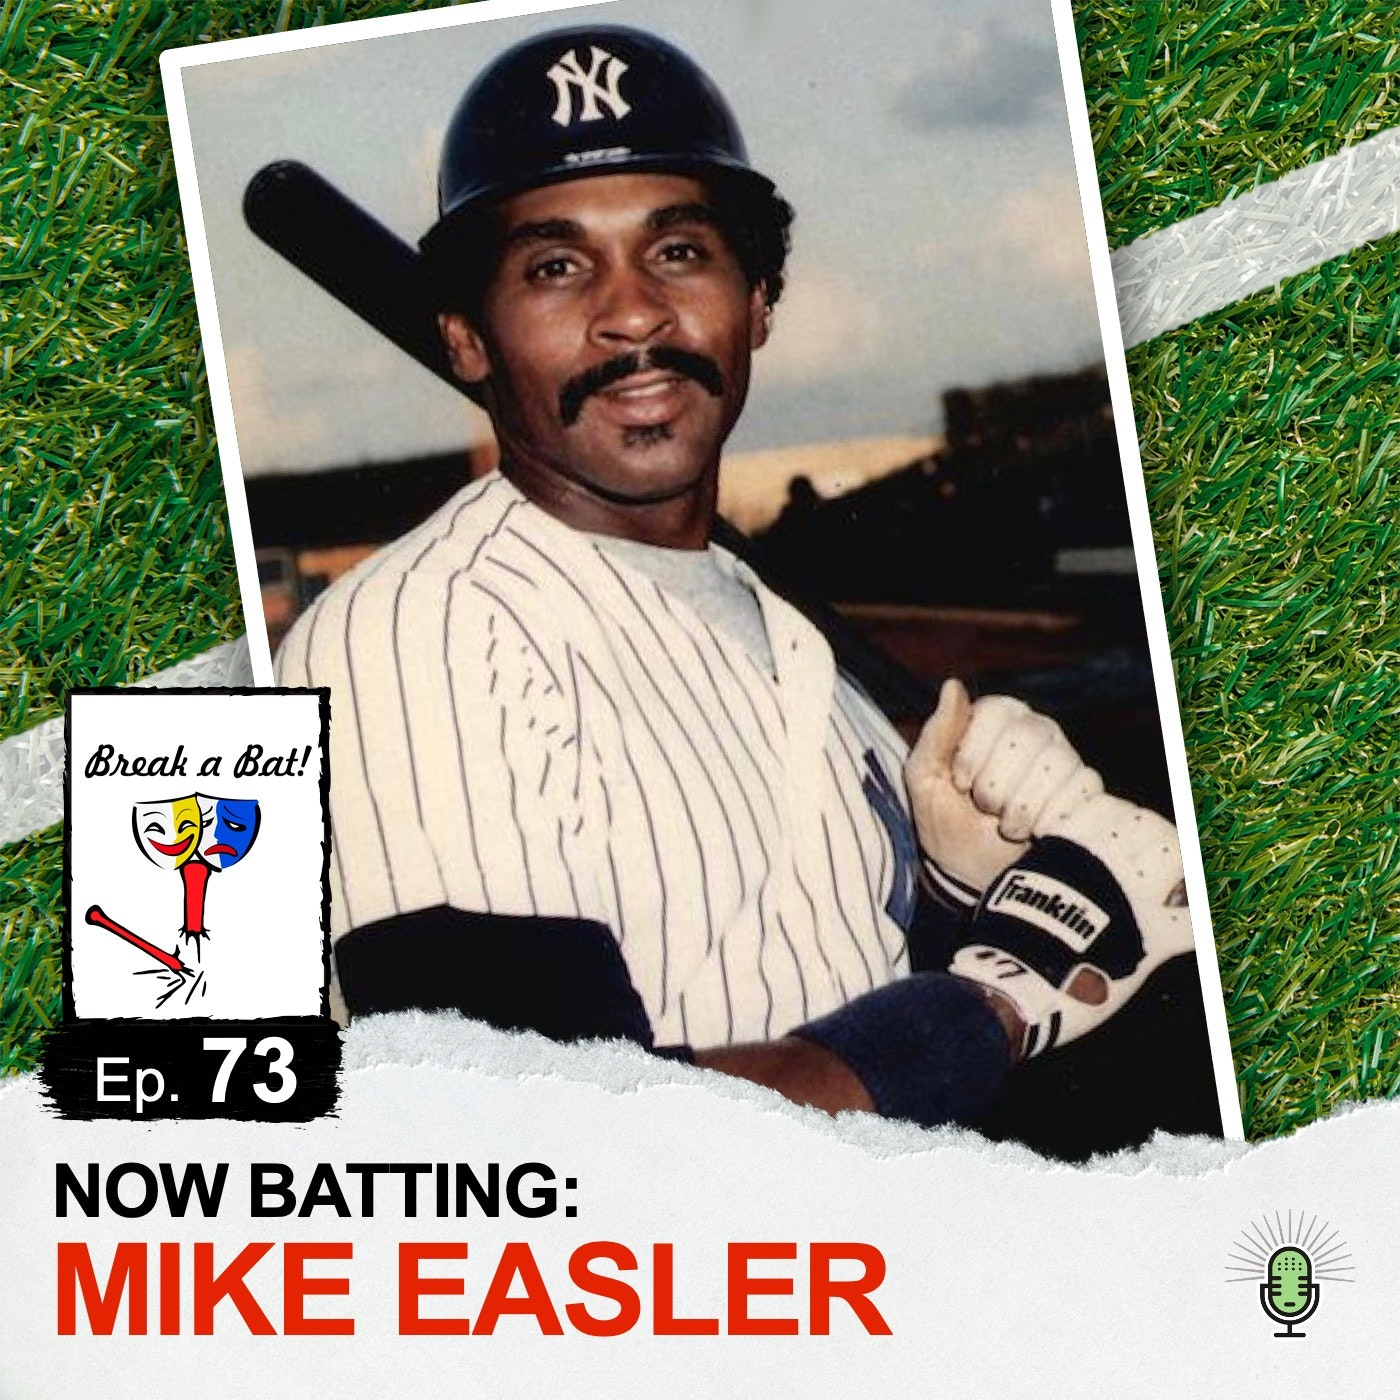 #73 - Now Batting: Mike Easler